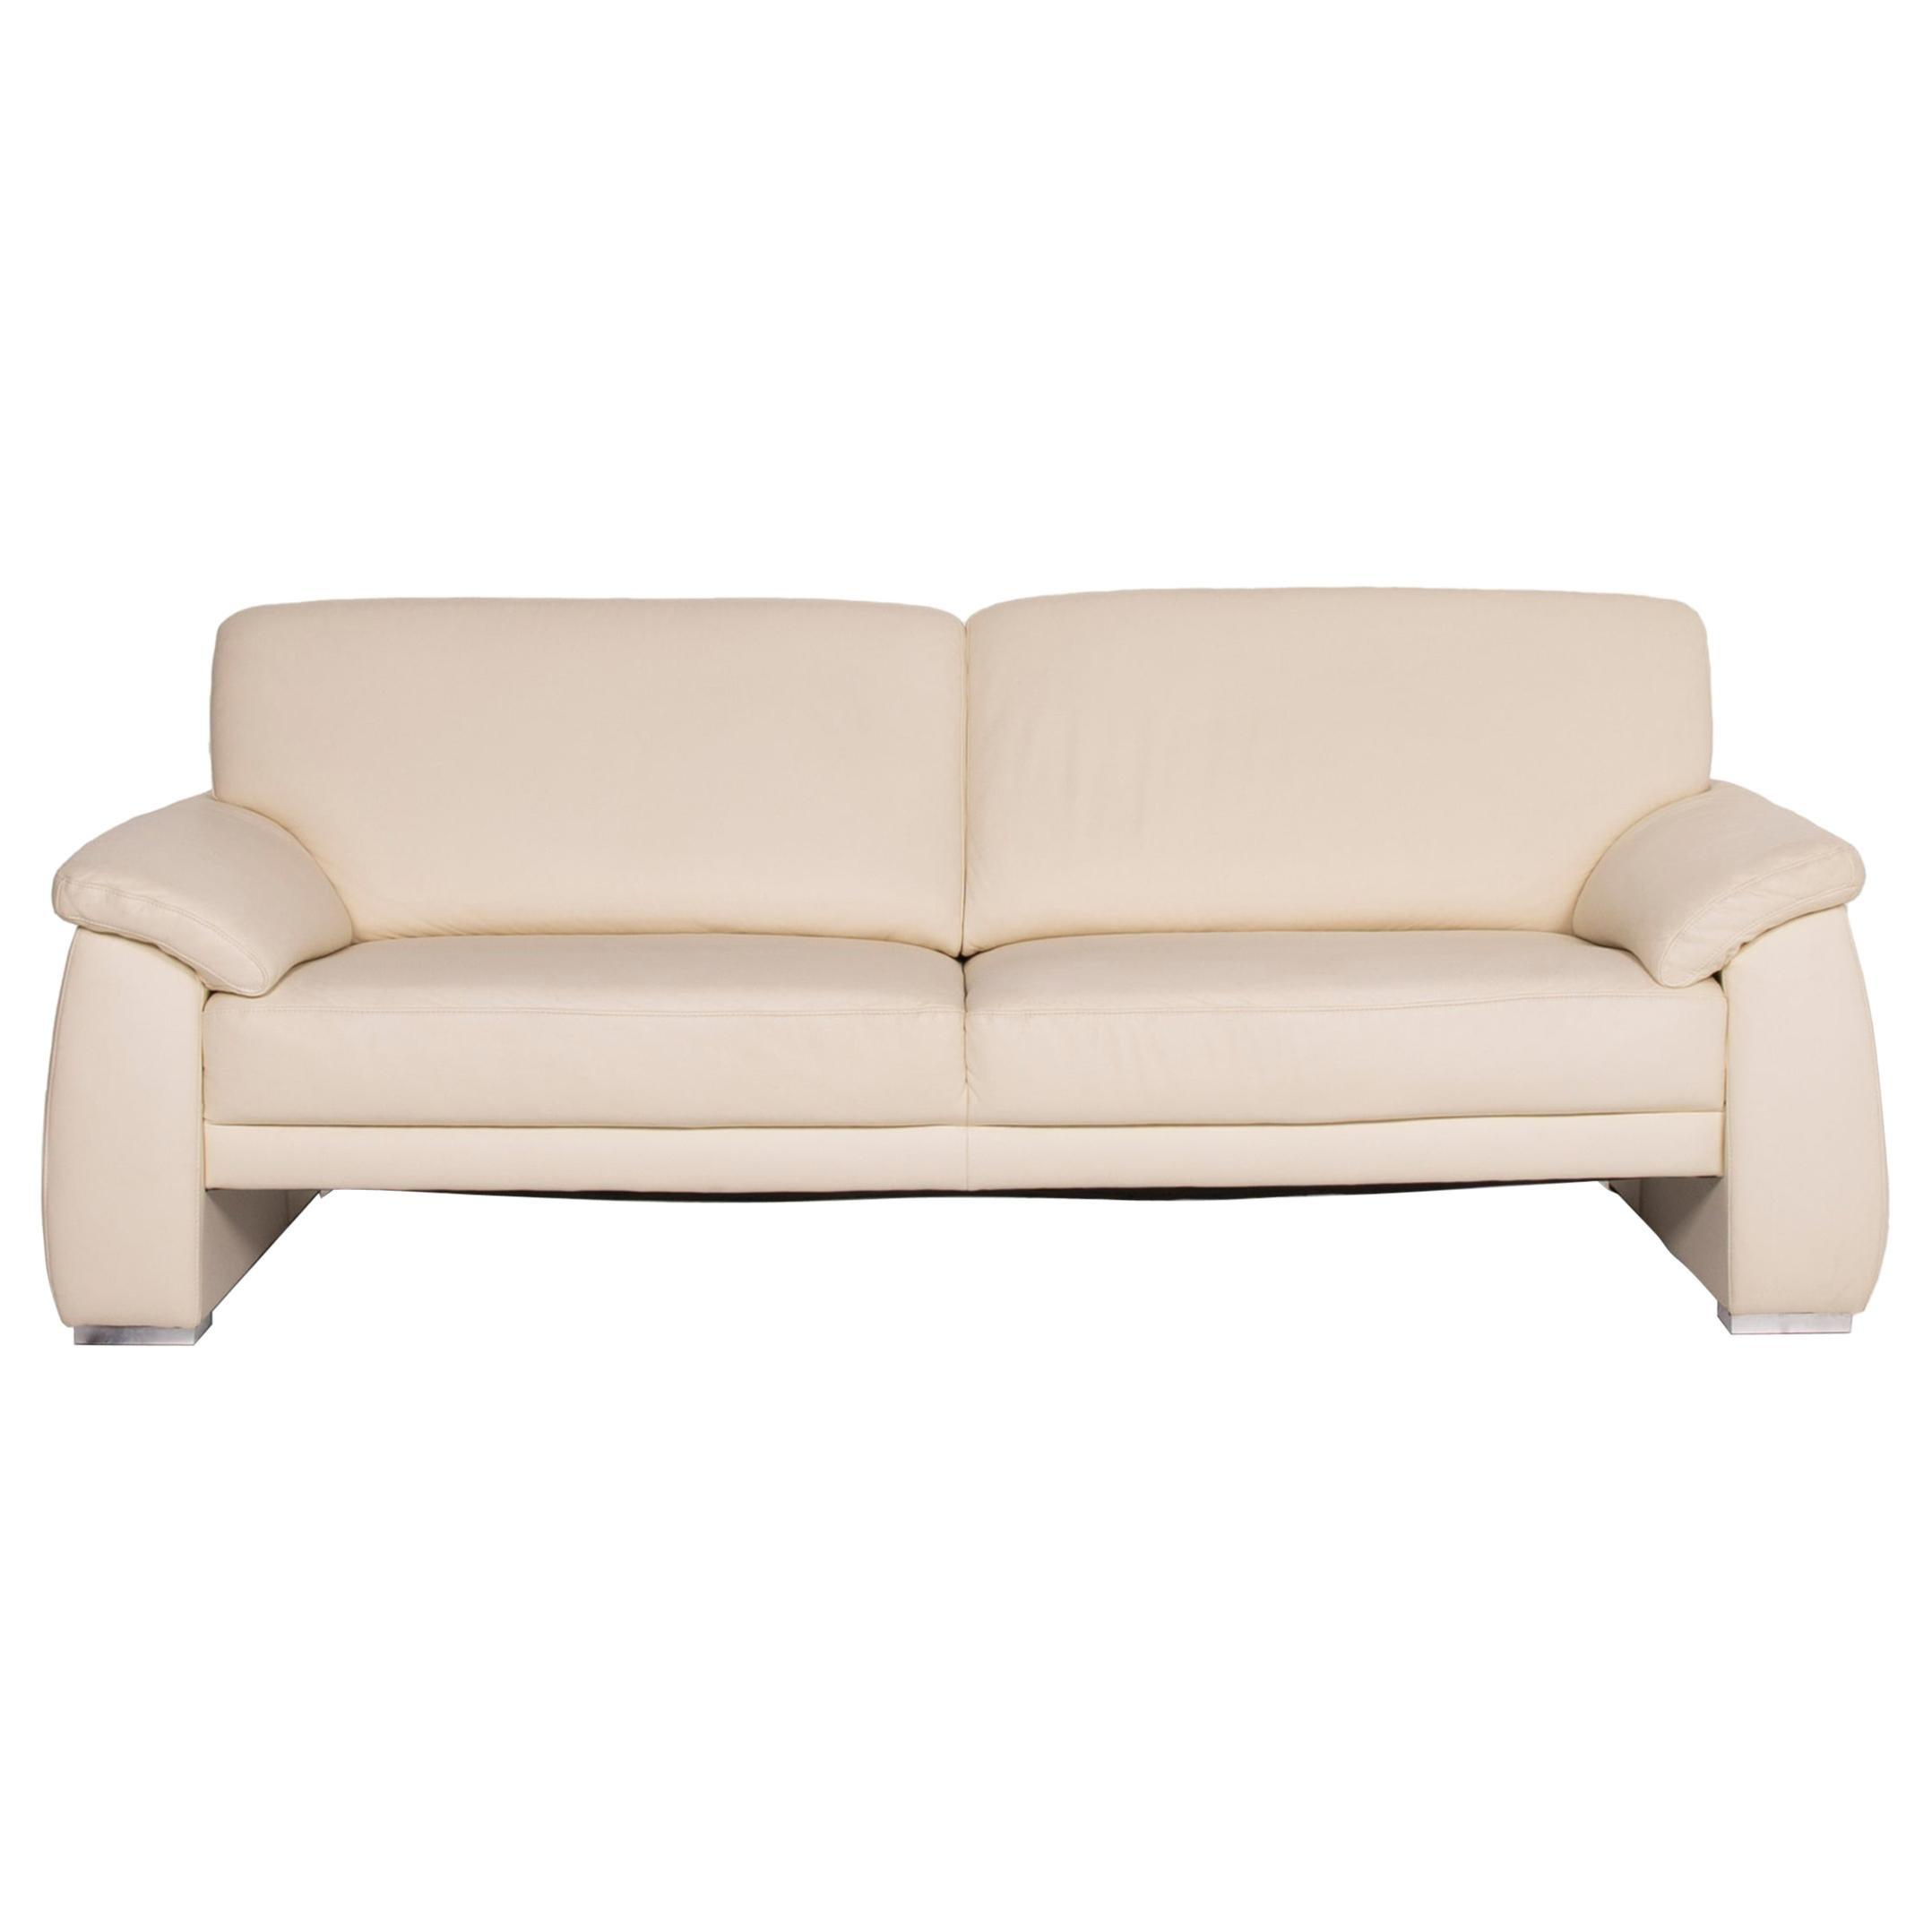 Mondo Leather Sofa Cream Three-Seater